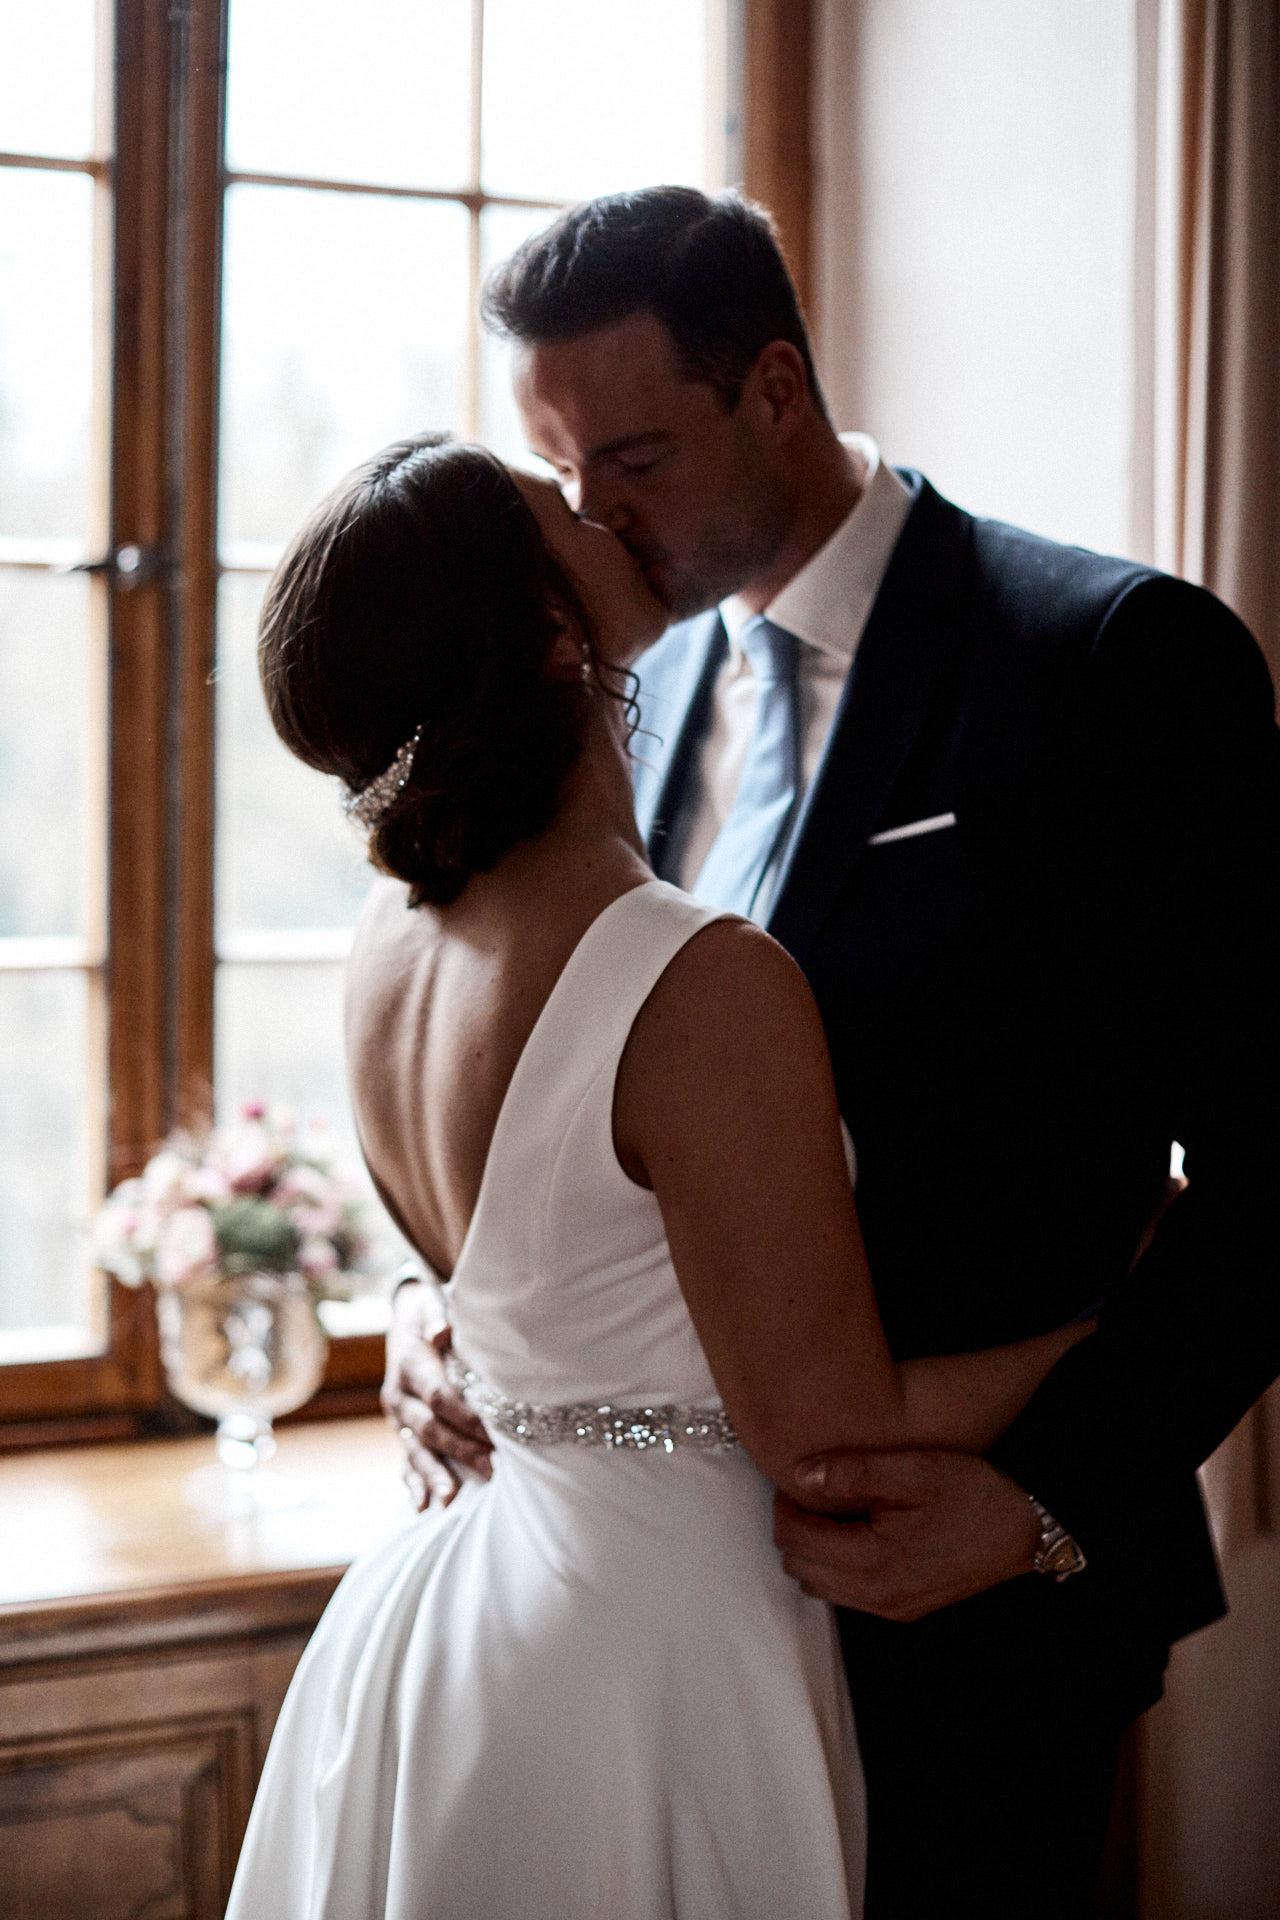 2019-12-20 Laura & Robin - Alena and Daniel Weddings 0218